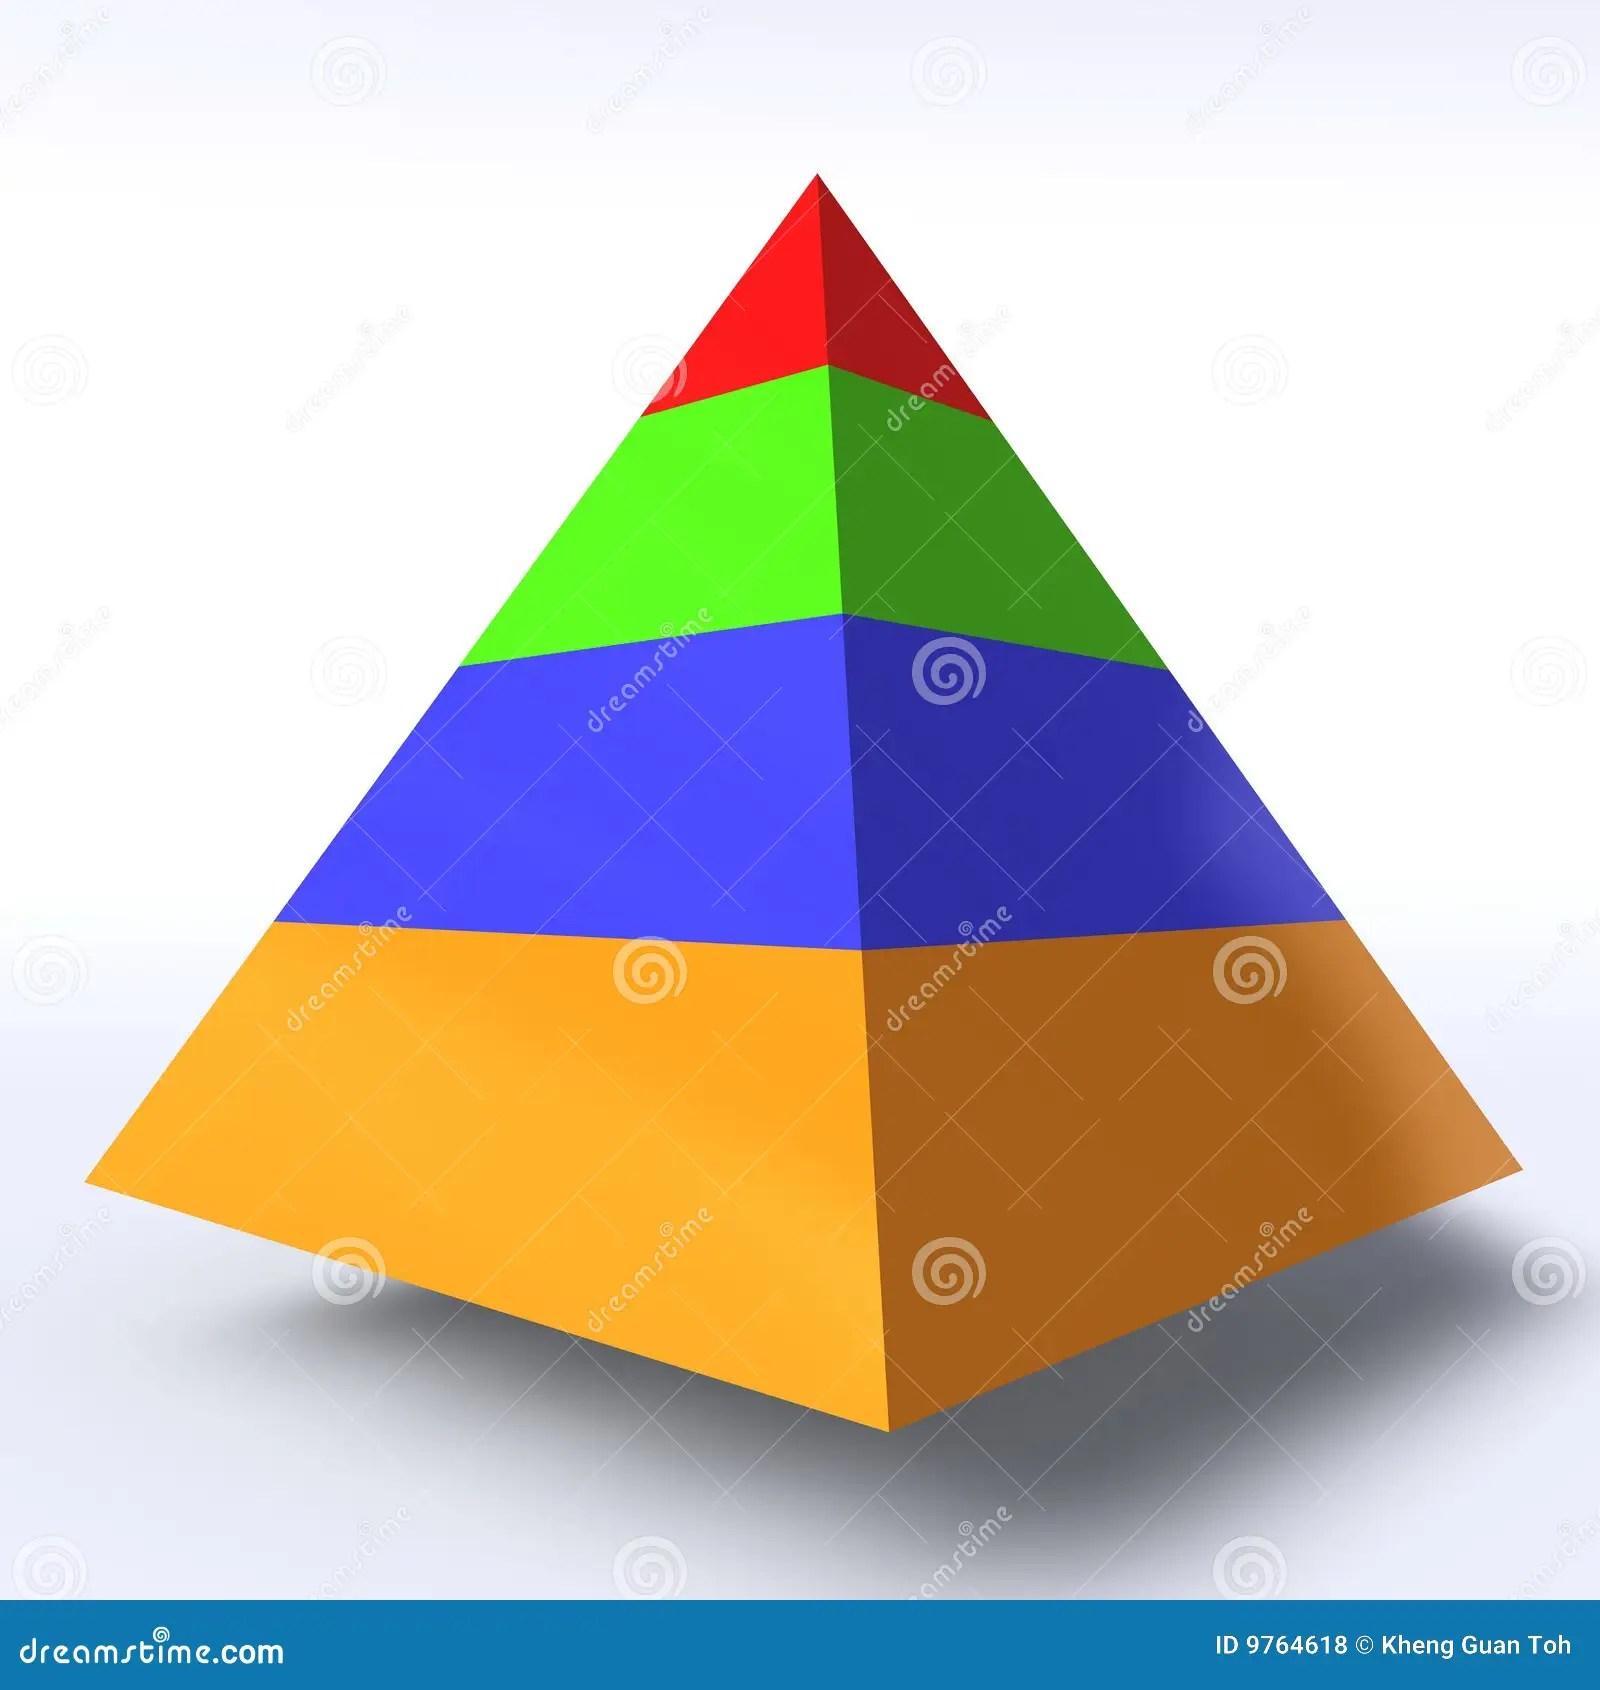 blank pyramid diagram 5 mf 135 wiring massey ferguson tractor sel system hierarchy royalty free stock photos - image: 9764618